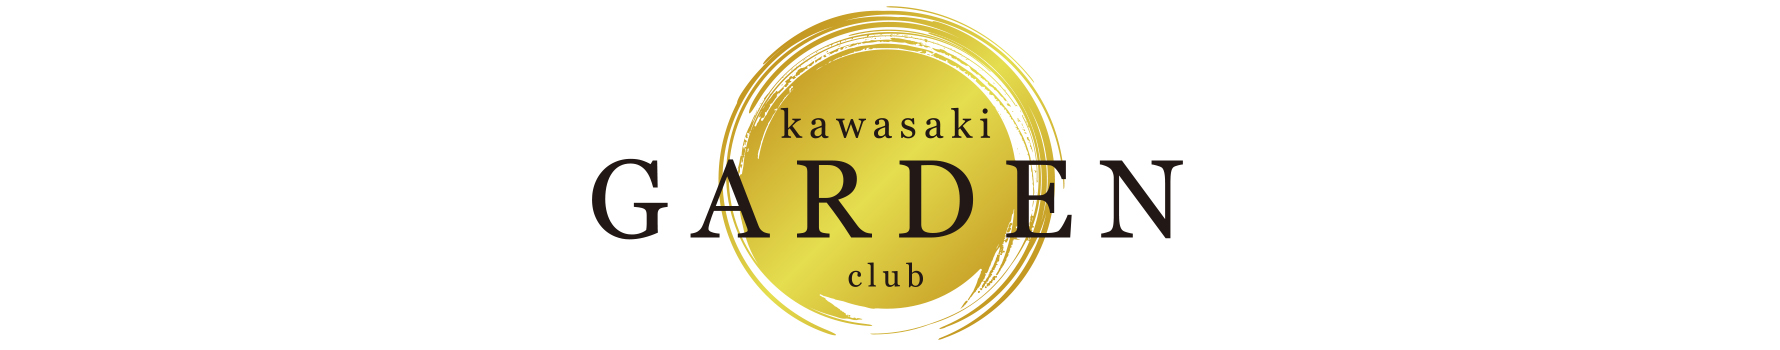 club kawasaki GARDEN【クラブカワサキガーデン】(川崎)のロゴ